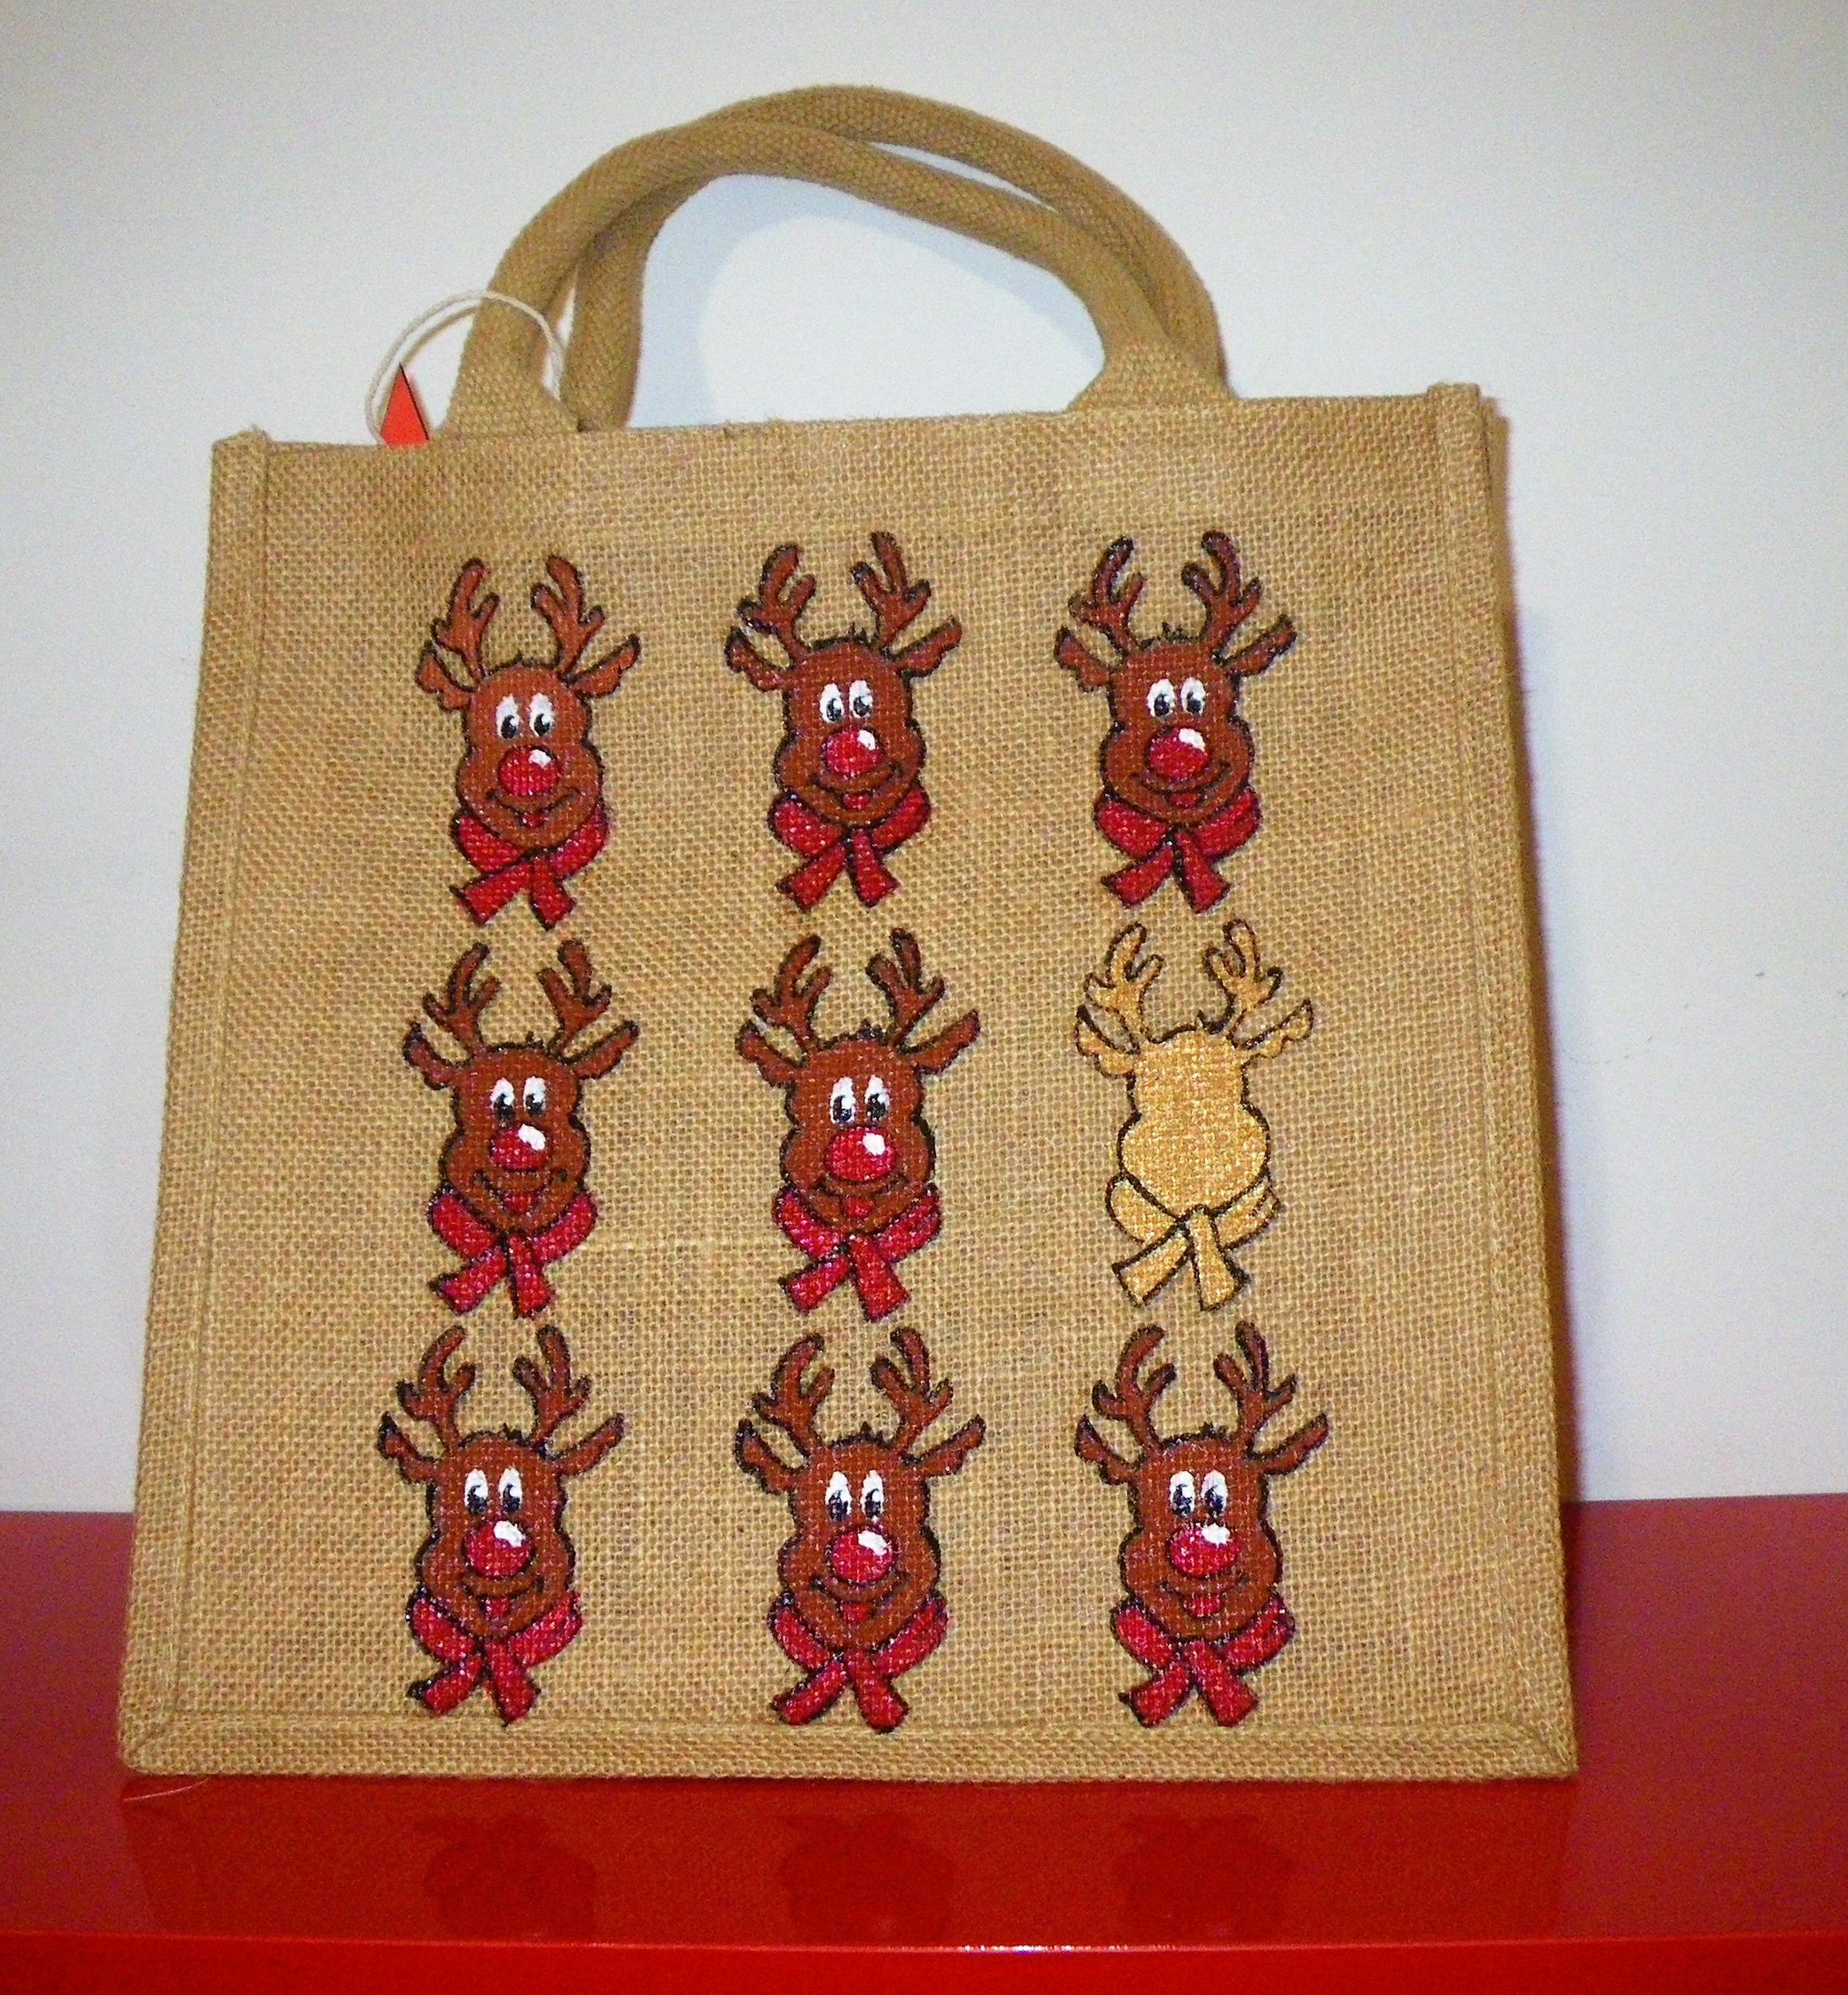 Sac jute medium avec rennes rigolos peints à la main